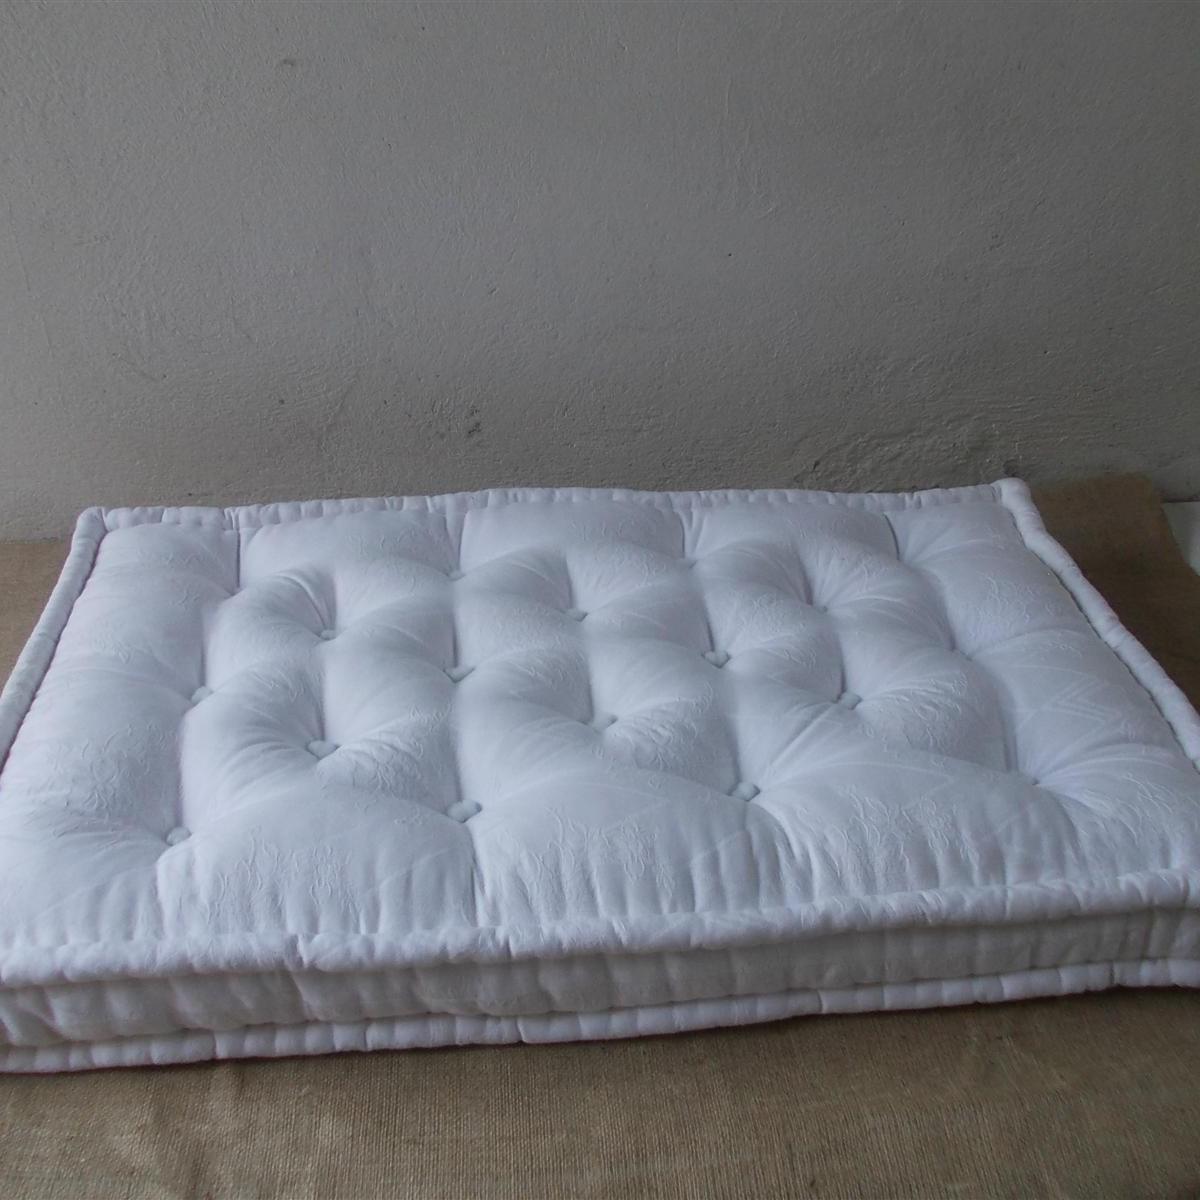 mattress ikea wool white simplistic pin image pinteres more futons futon only